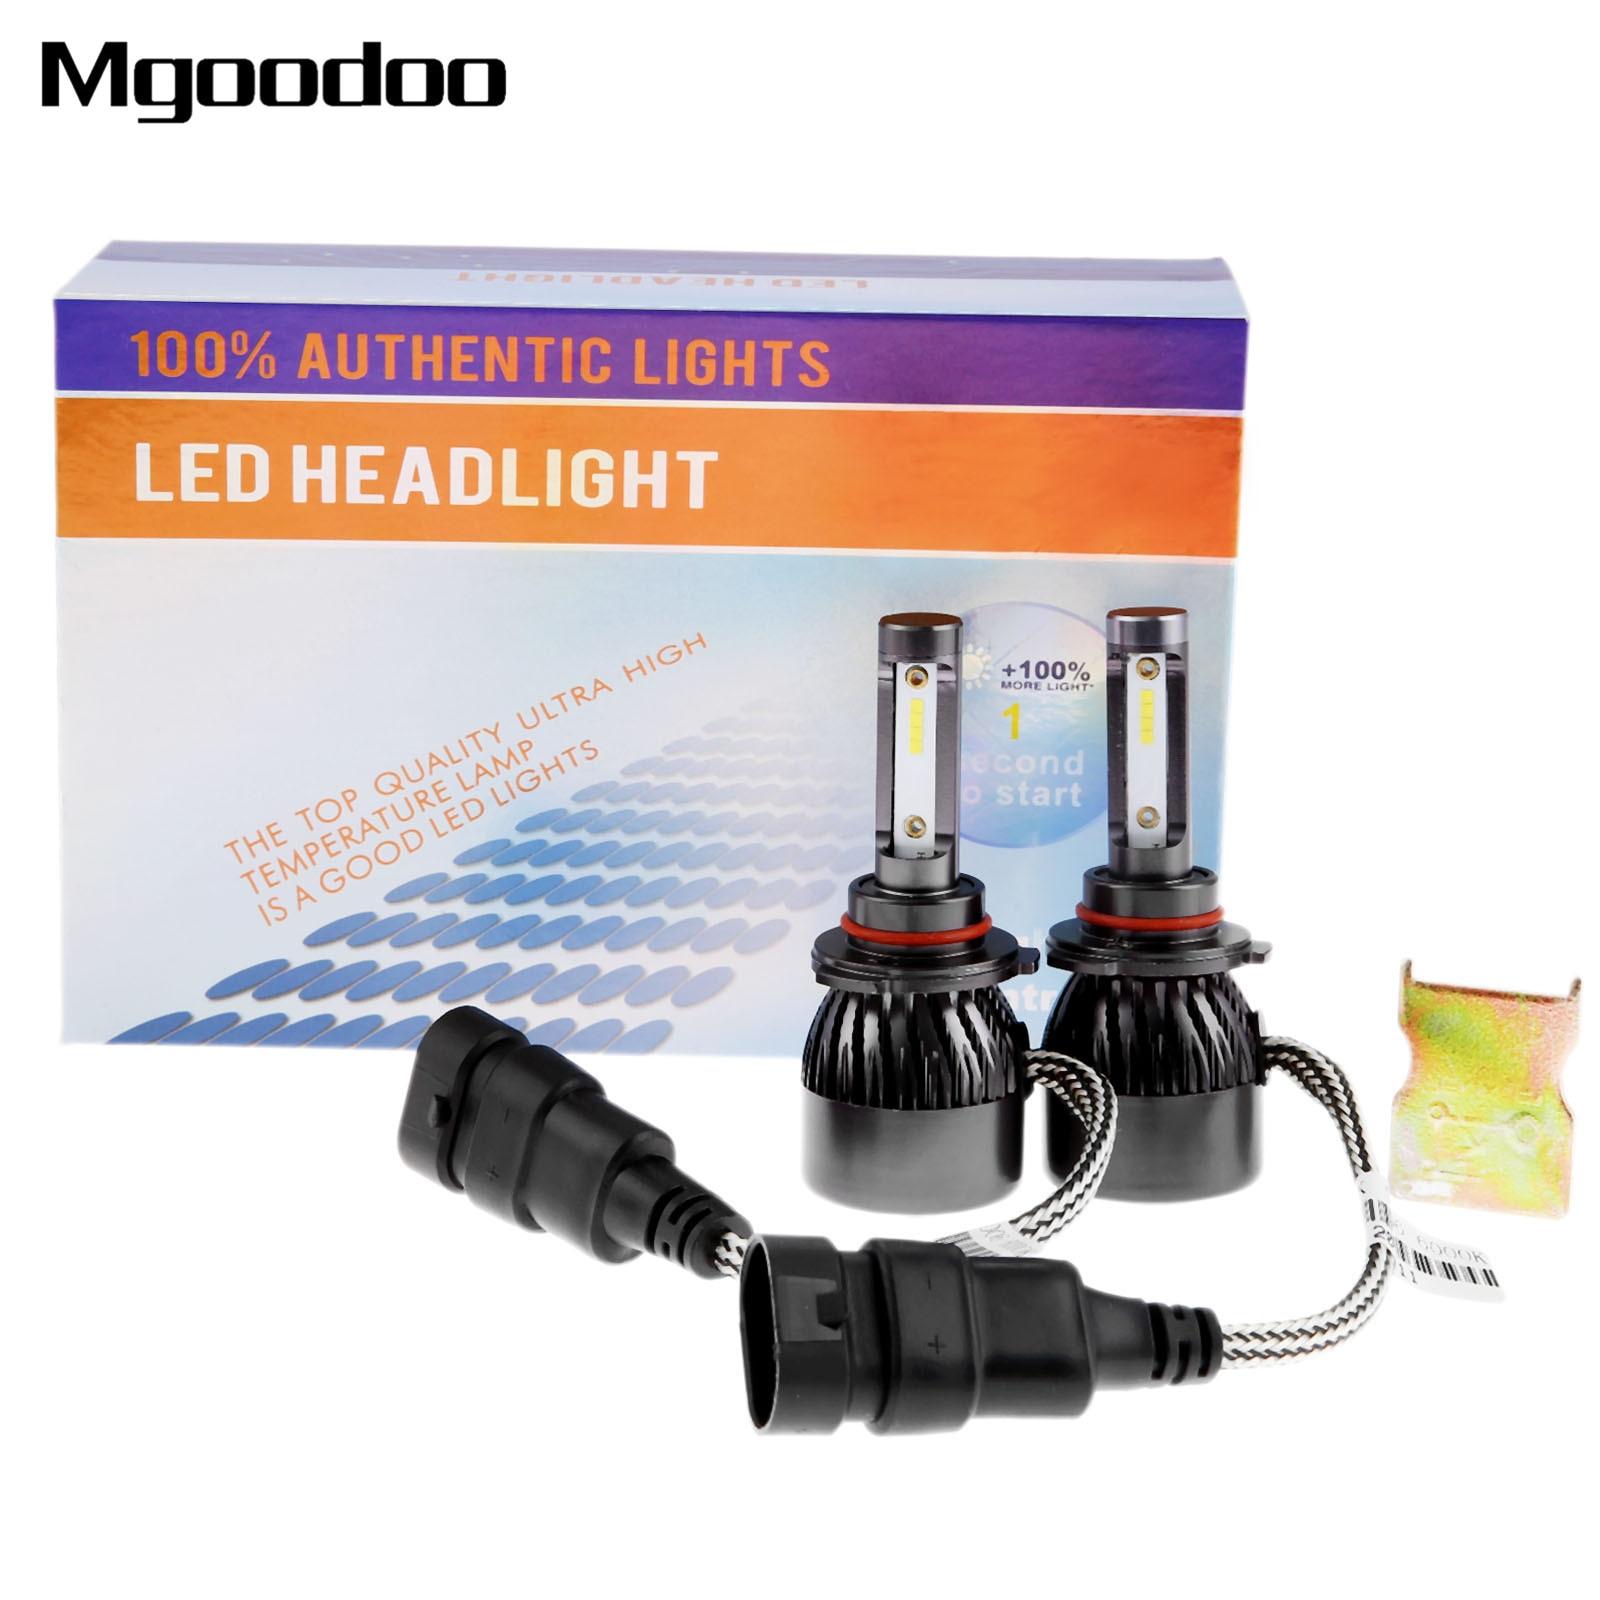 9006 LED Headlight 44W 5600LM Car Led Headlights Conversion Kit High/Low Beam Bulbs 6000K Auto Replacement Super Bright Headlamp